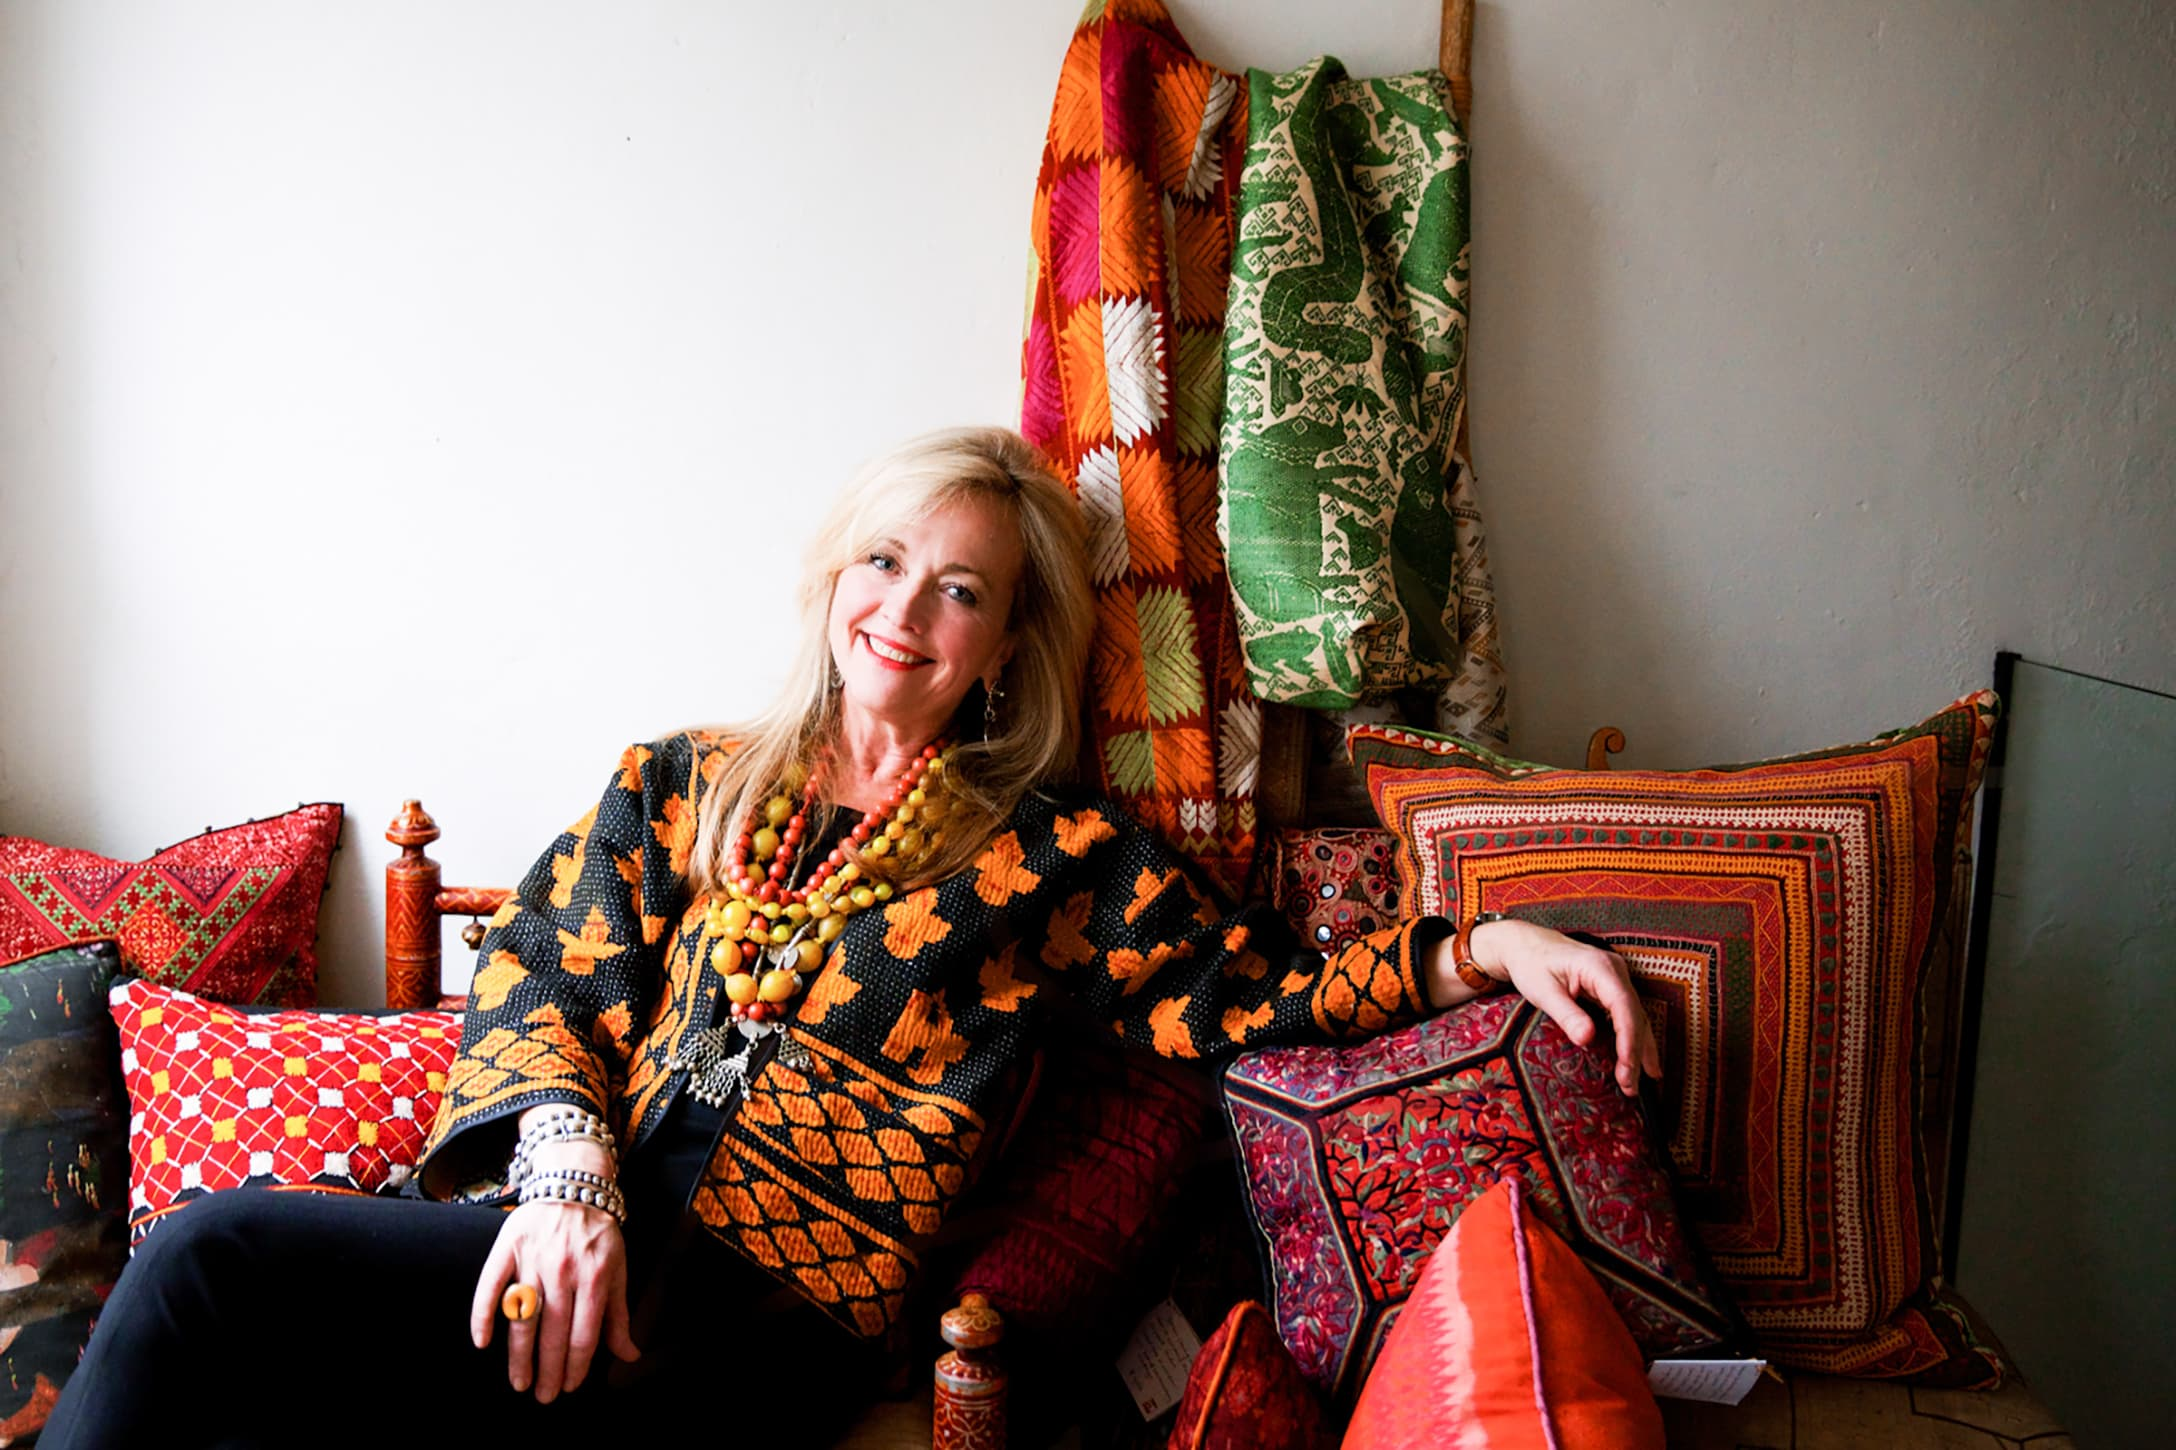 Susan Walker at IBU featured on Cindy Hattersley's blog